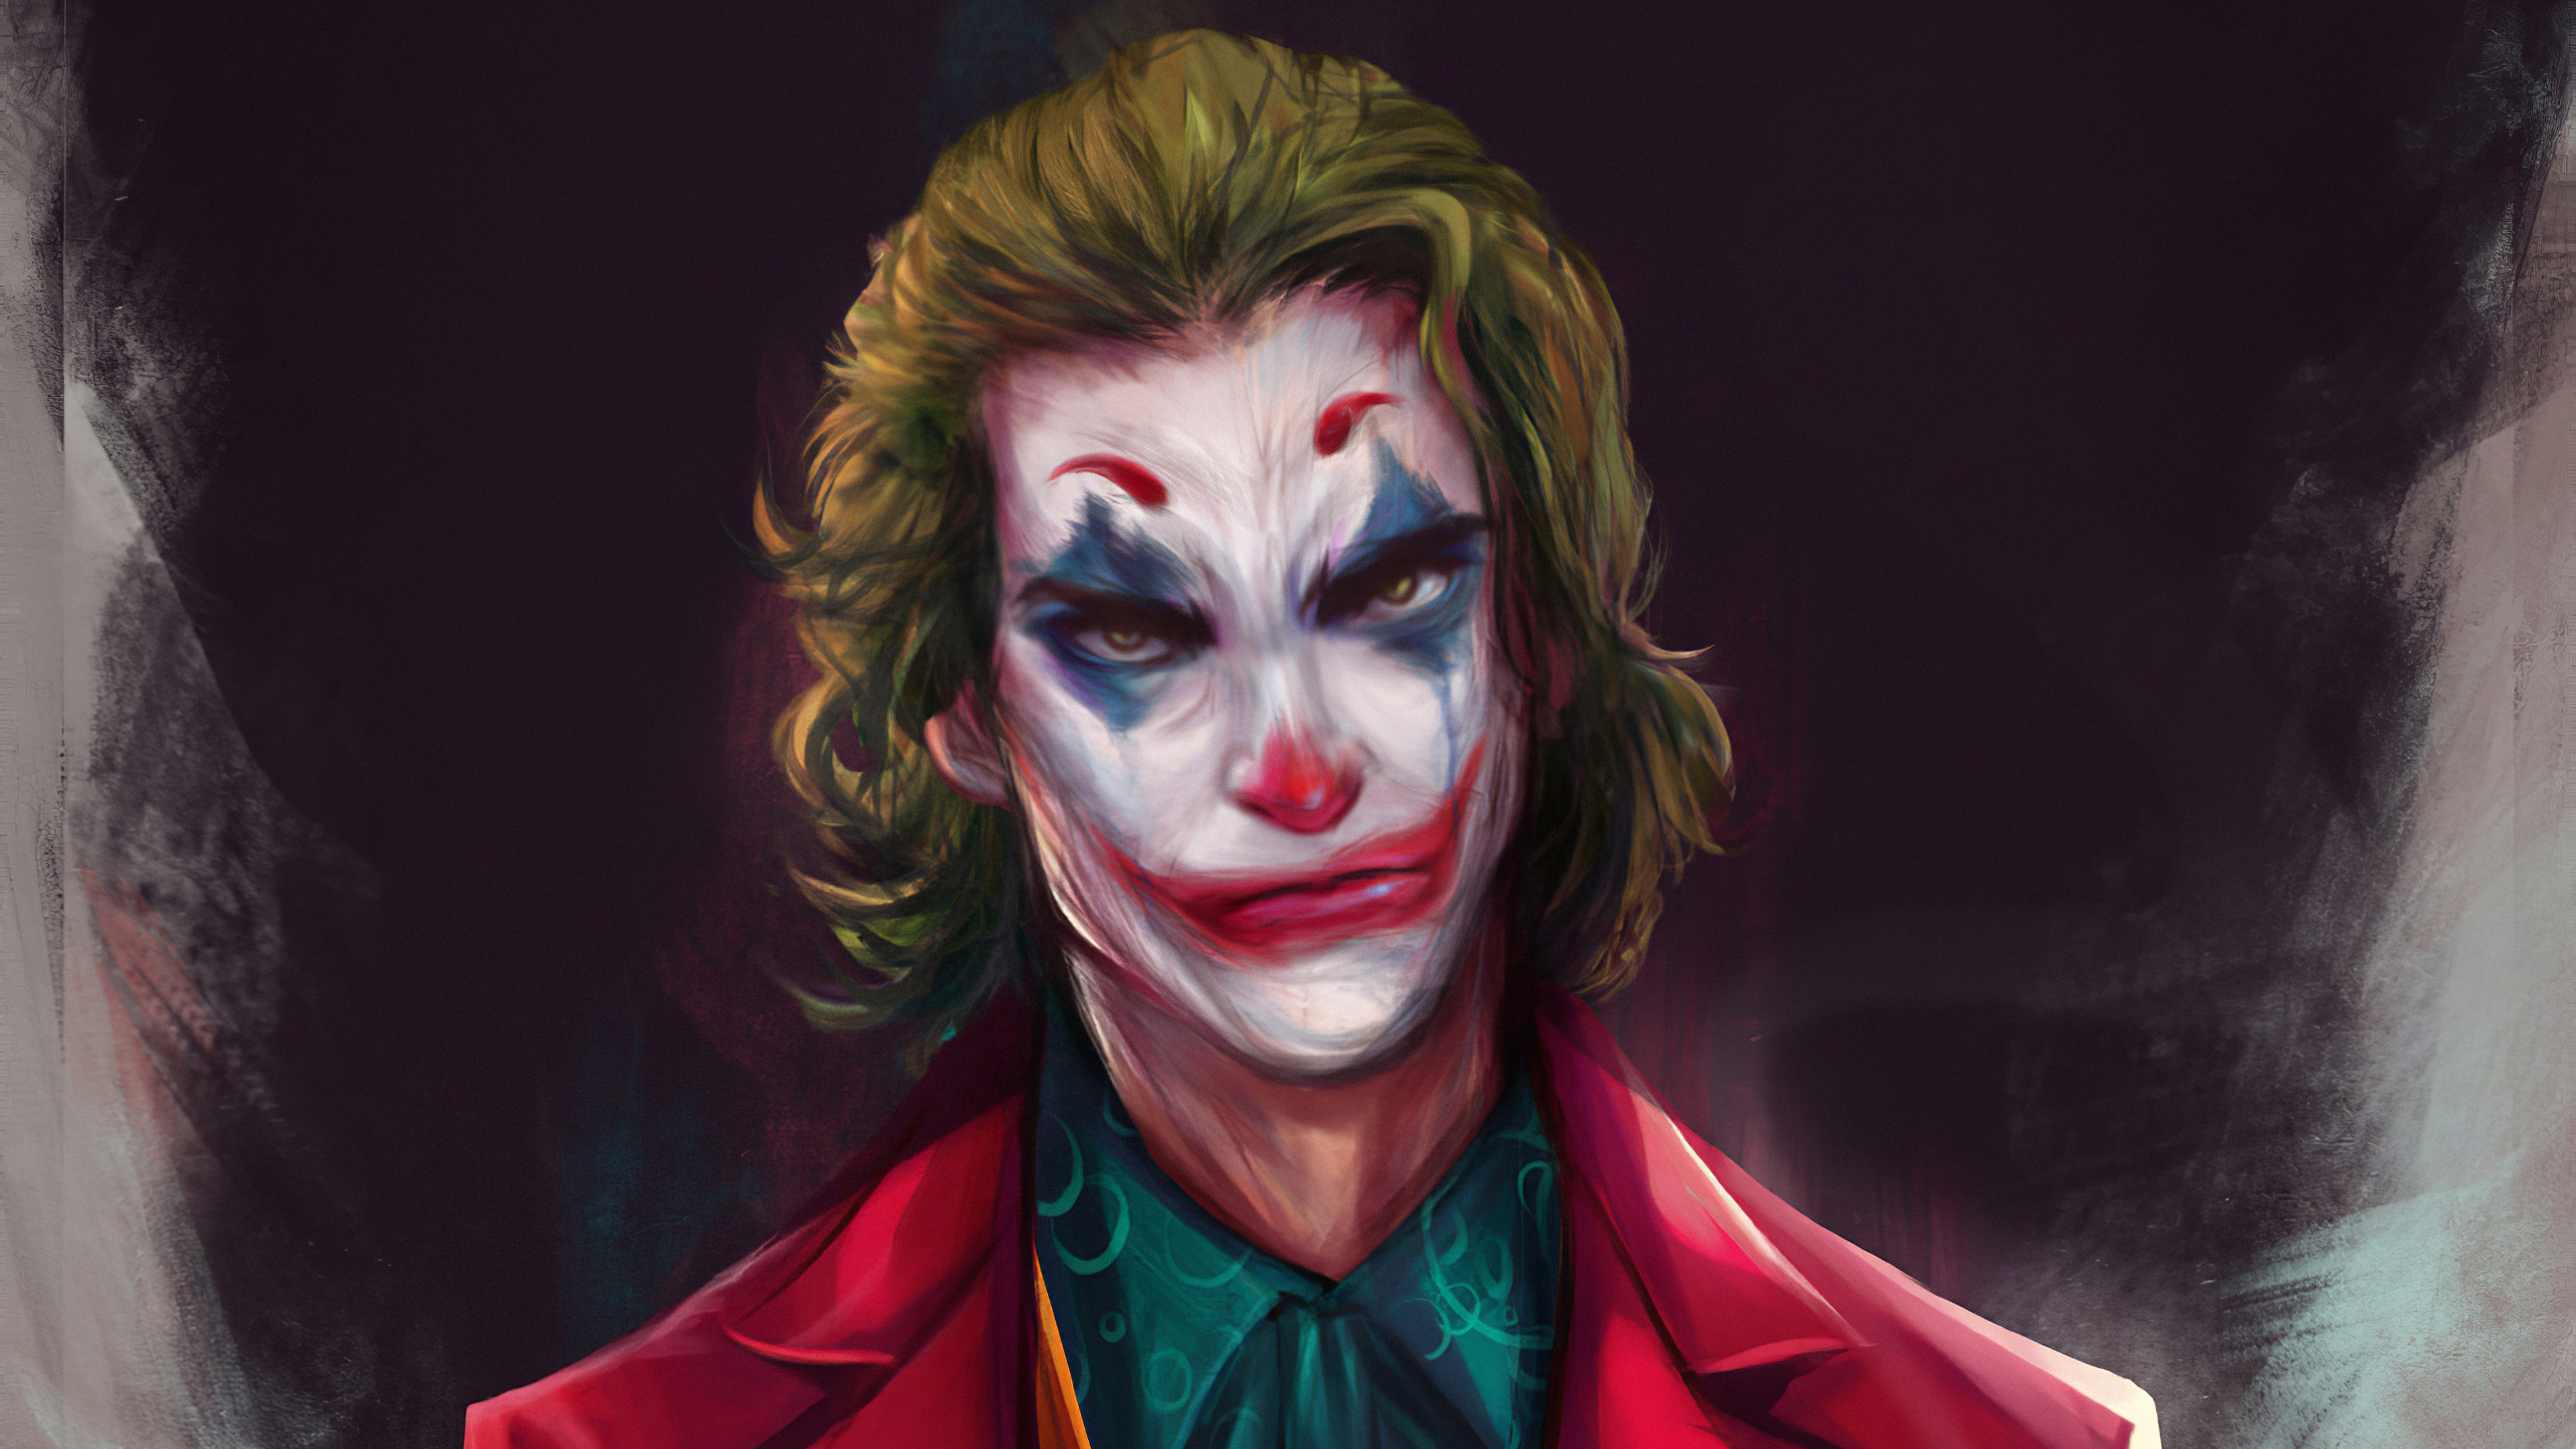 joker sketch art new 1572368699 - Joker Sketch Art New - supervillain wallpapers, superheroes wallpapers, joker wallpapers, joker movie wallpapers, hd-wallpapers, 4k-wallpapers